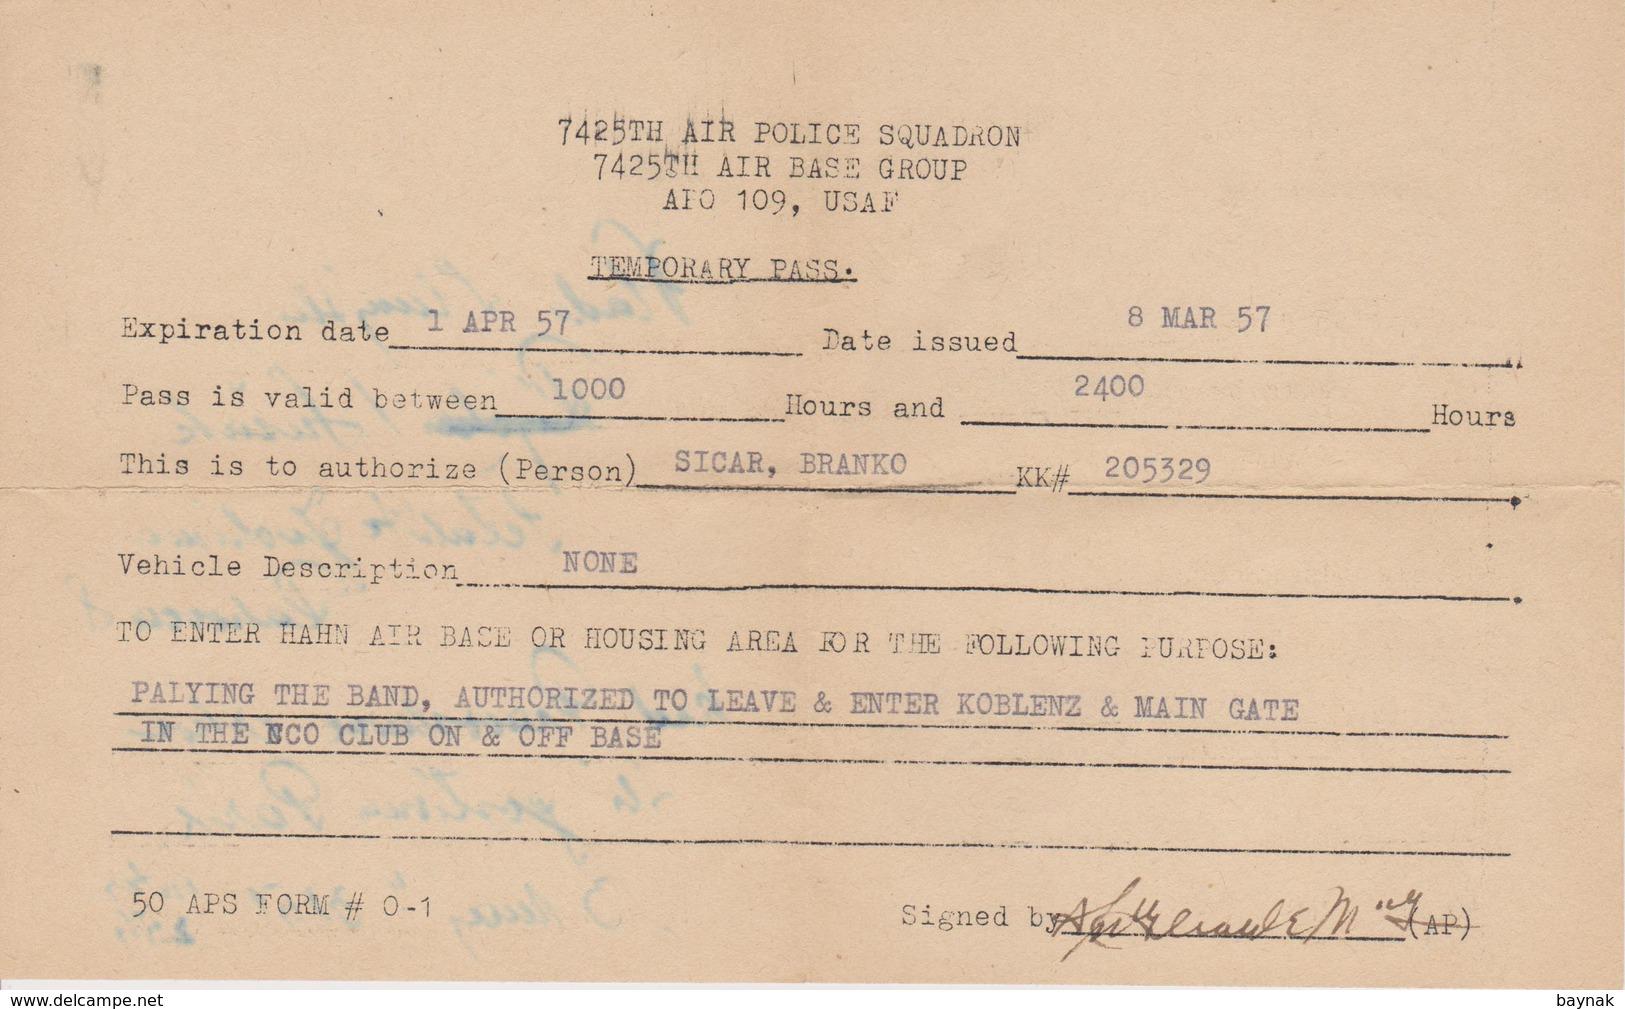 USA  ~  TEMPORARY PASS  ~  7425th AIR POLICE SQUADRON 7425 TH AIR BASE GROUP APO 109, USAF  ~  KOBLENZ, DEUTSCHLAND - Historische Dokumente